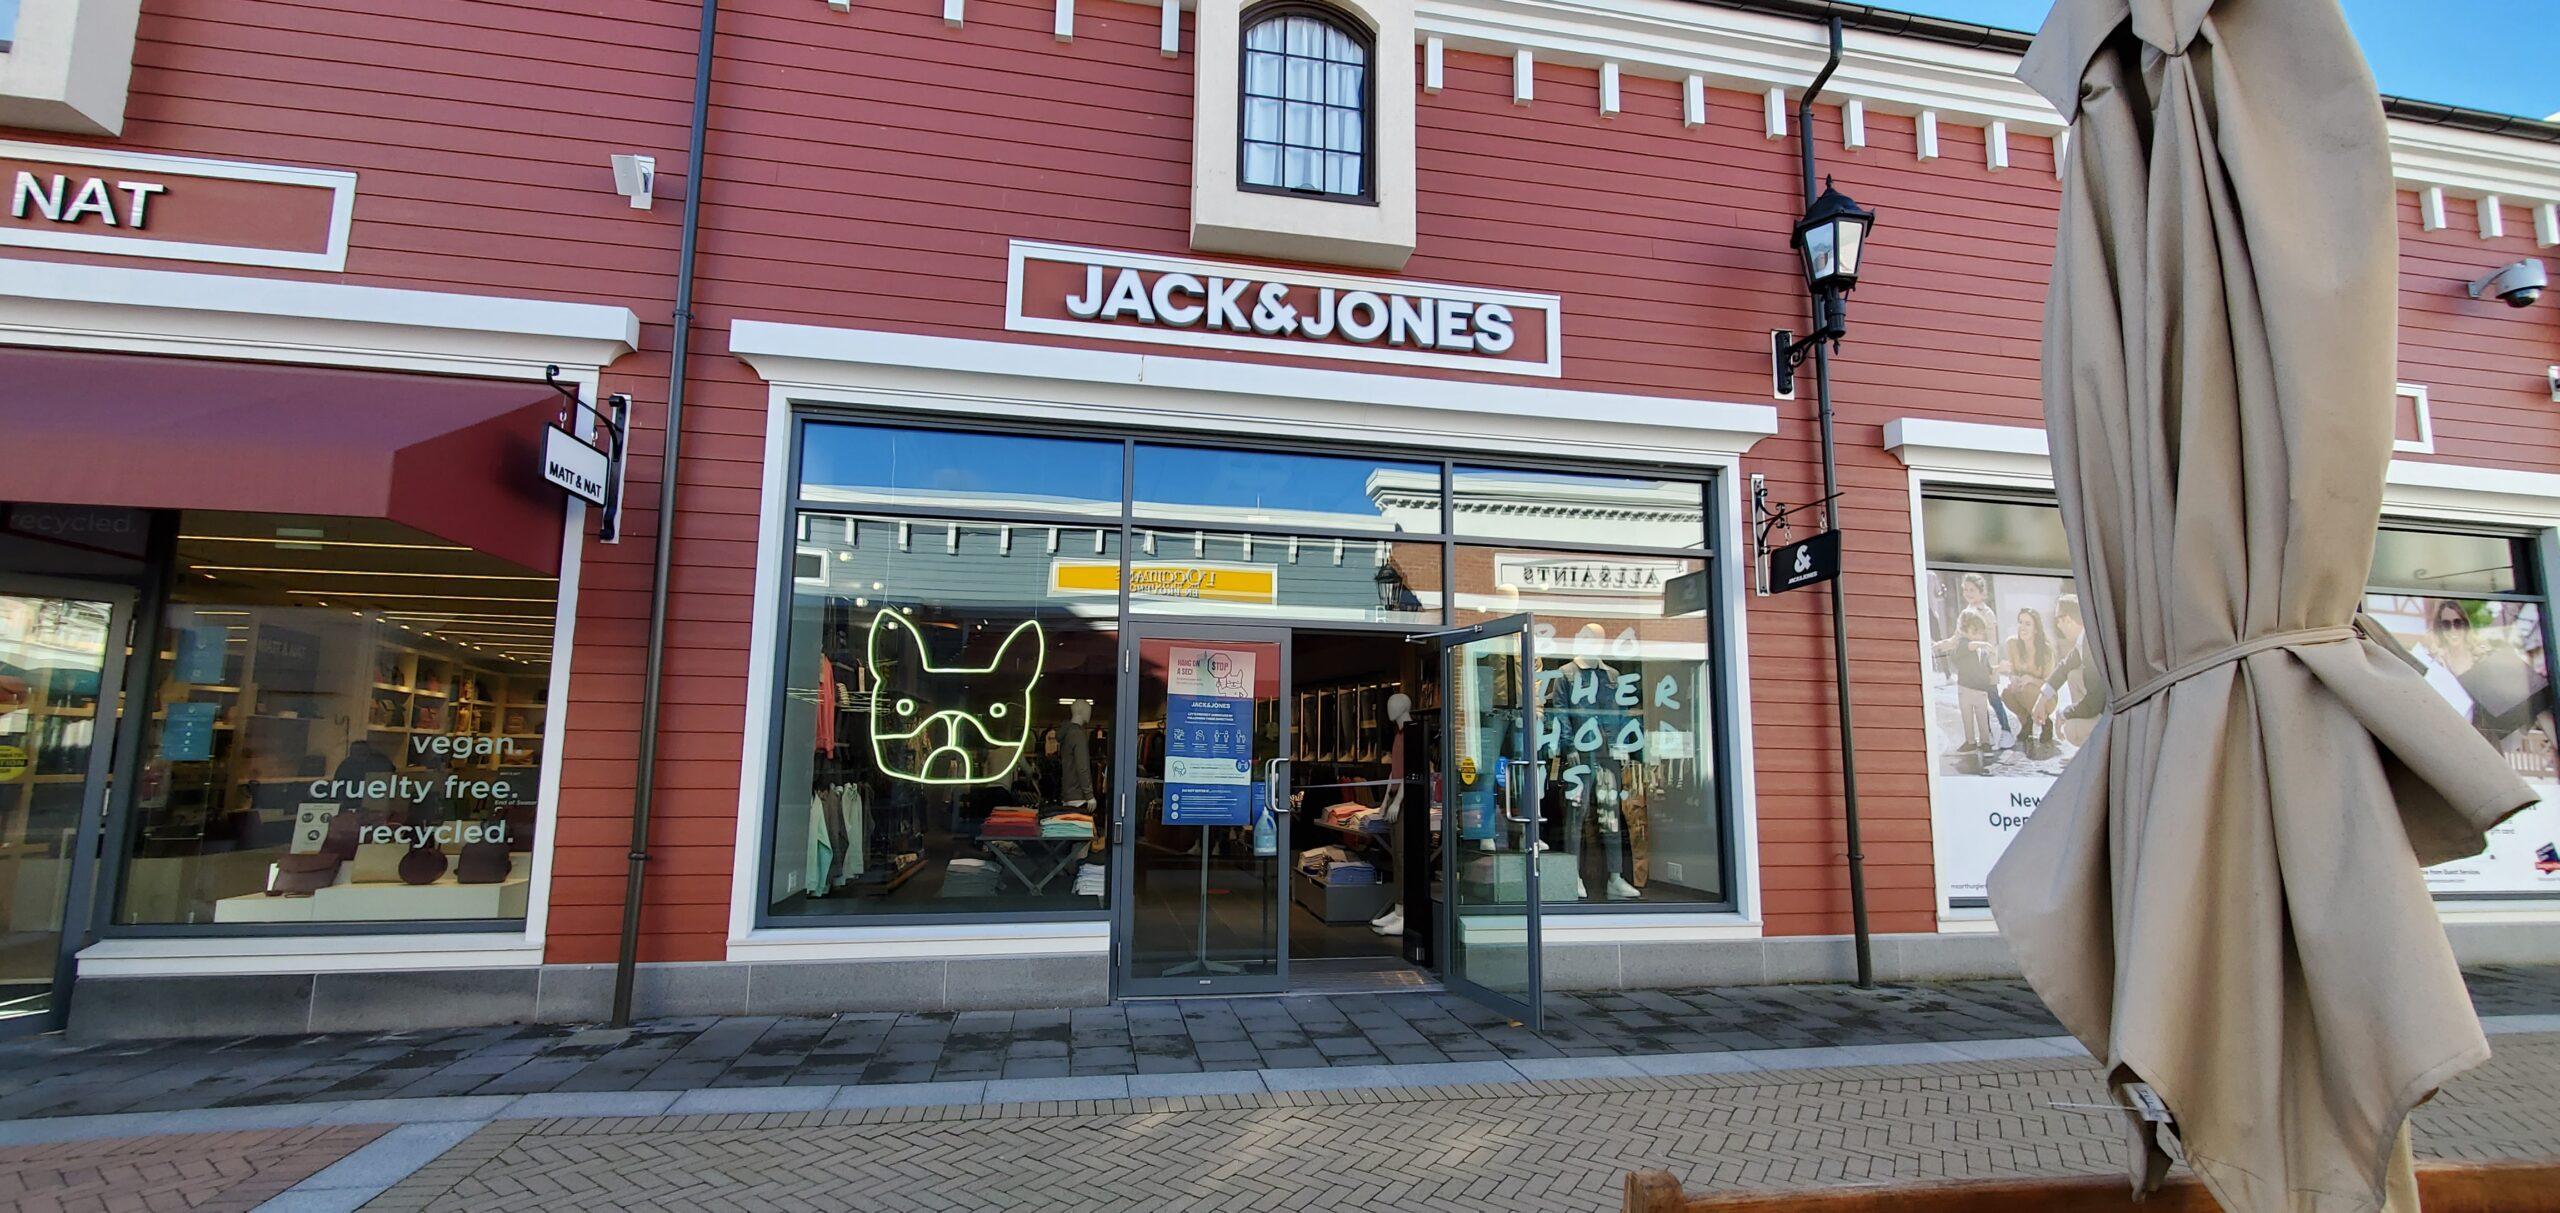 Jack & Jones at McArthur Glen